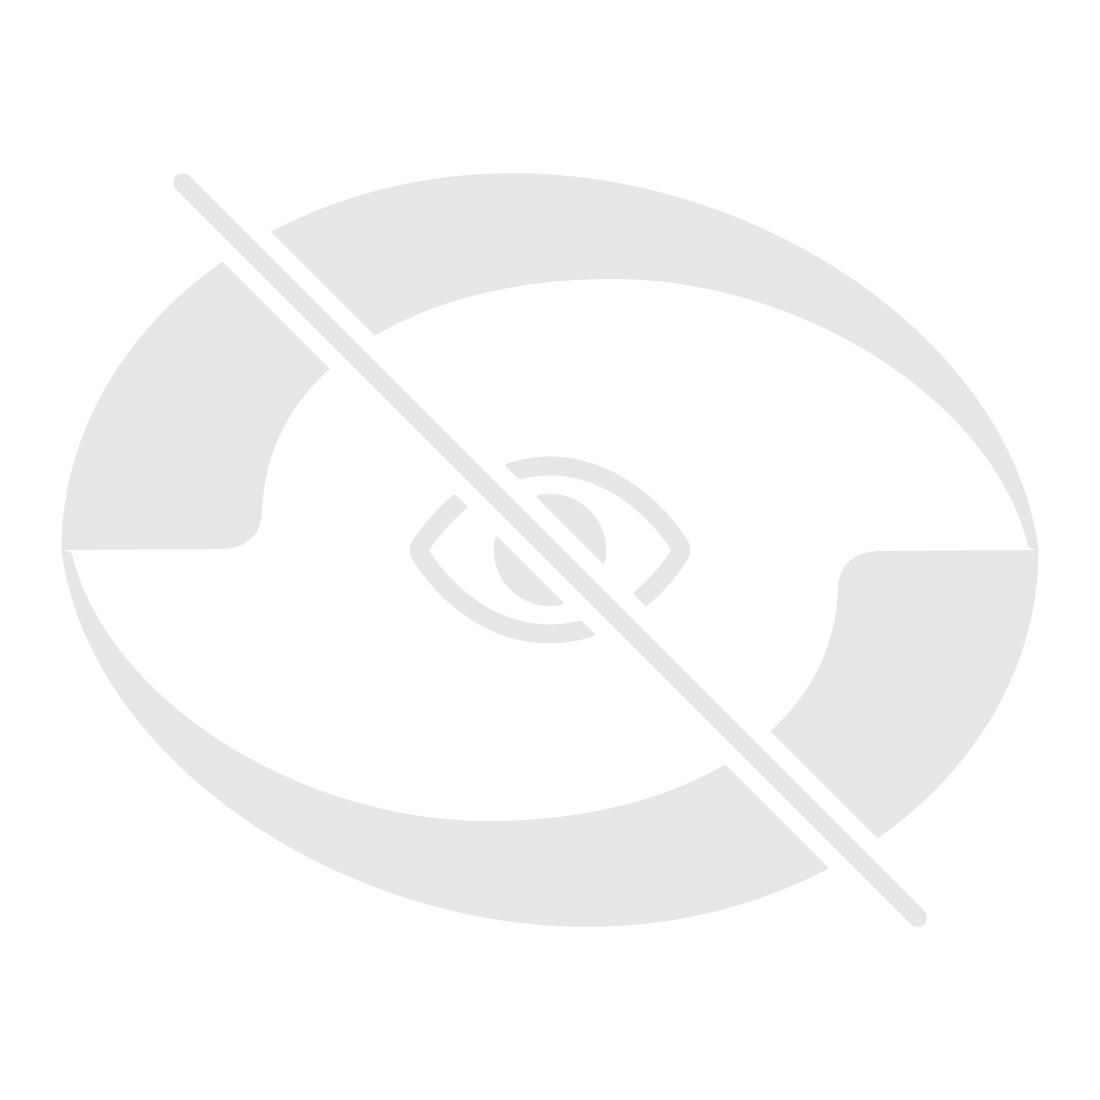 GeoVision GV-1240B-16 • 16 channel hybrid video capture card